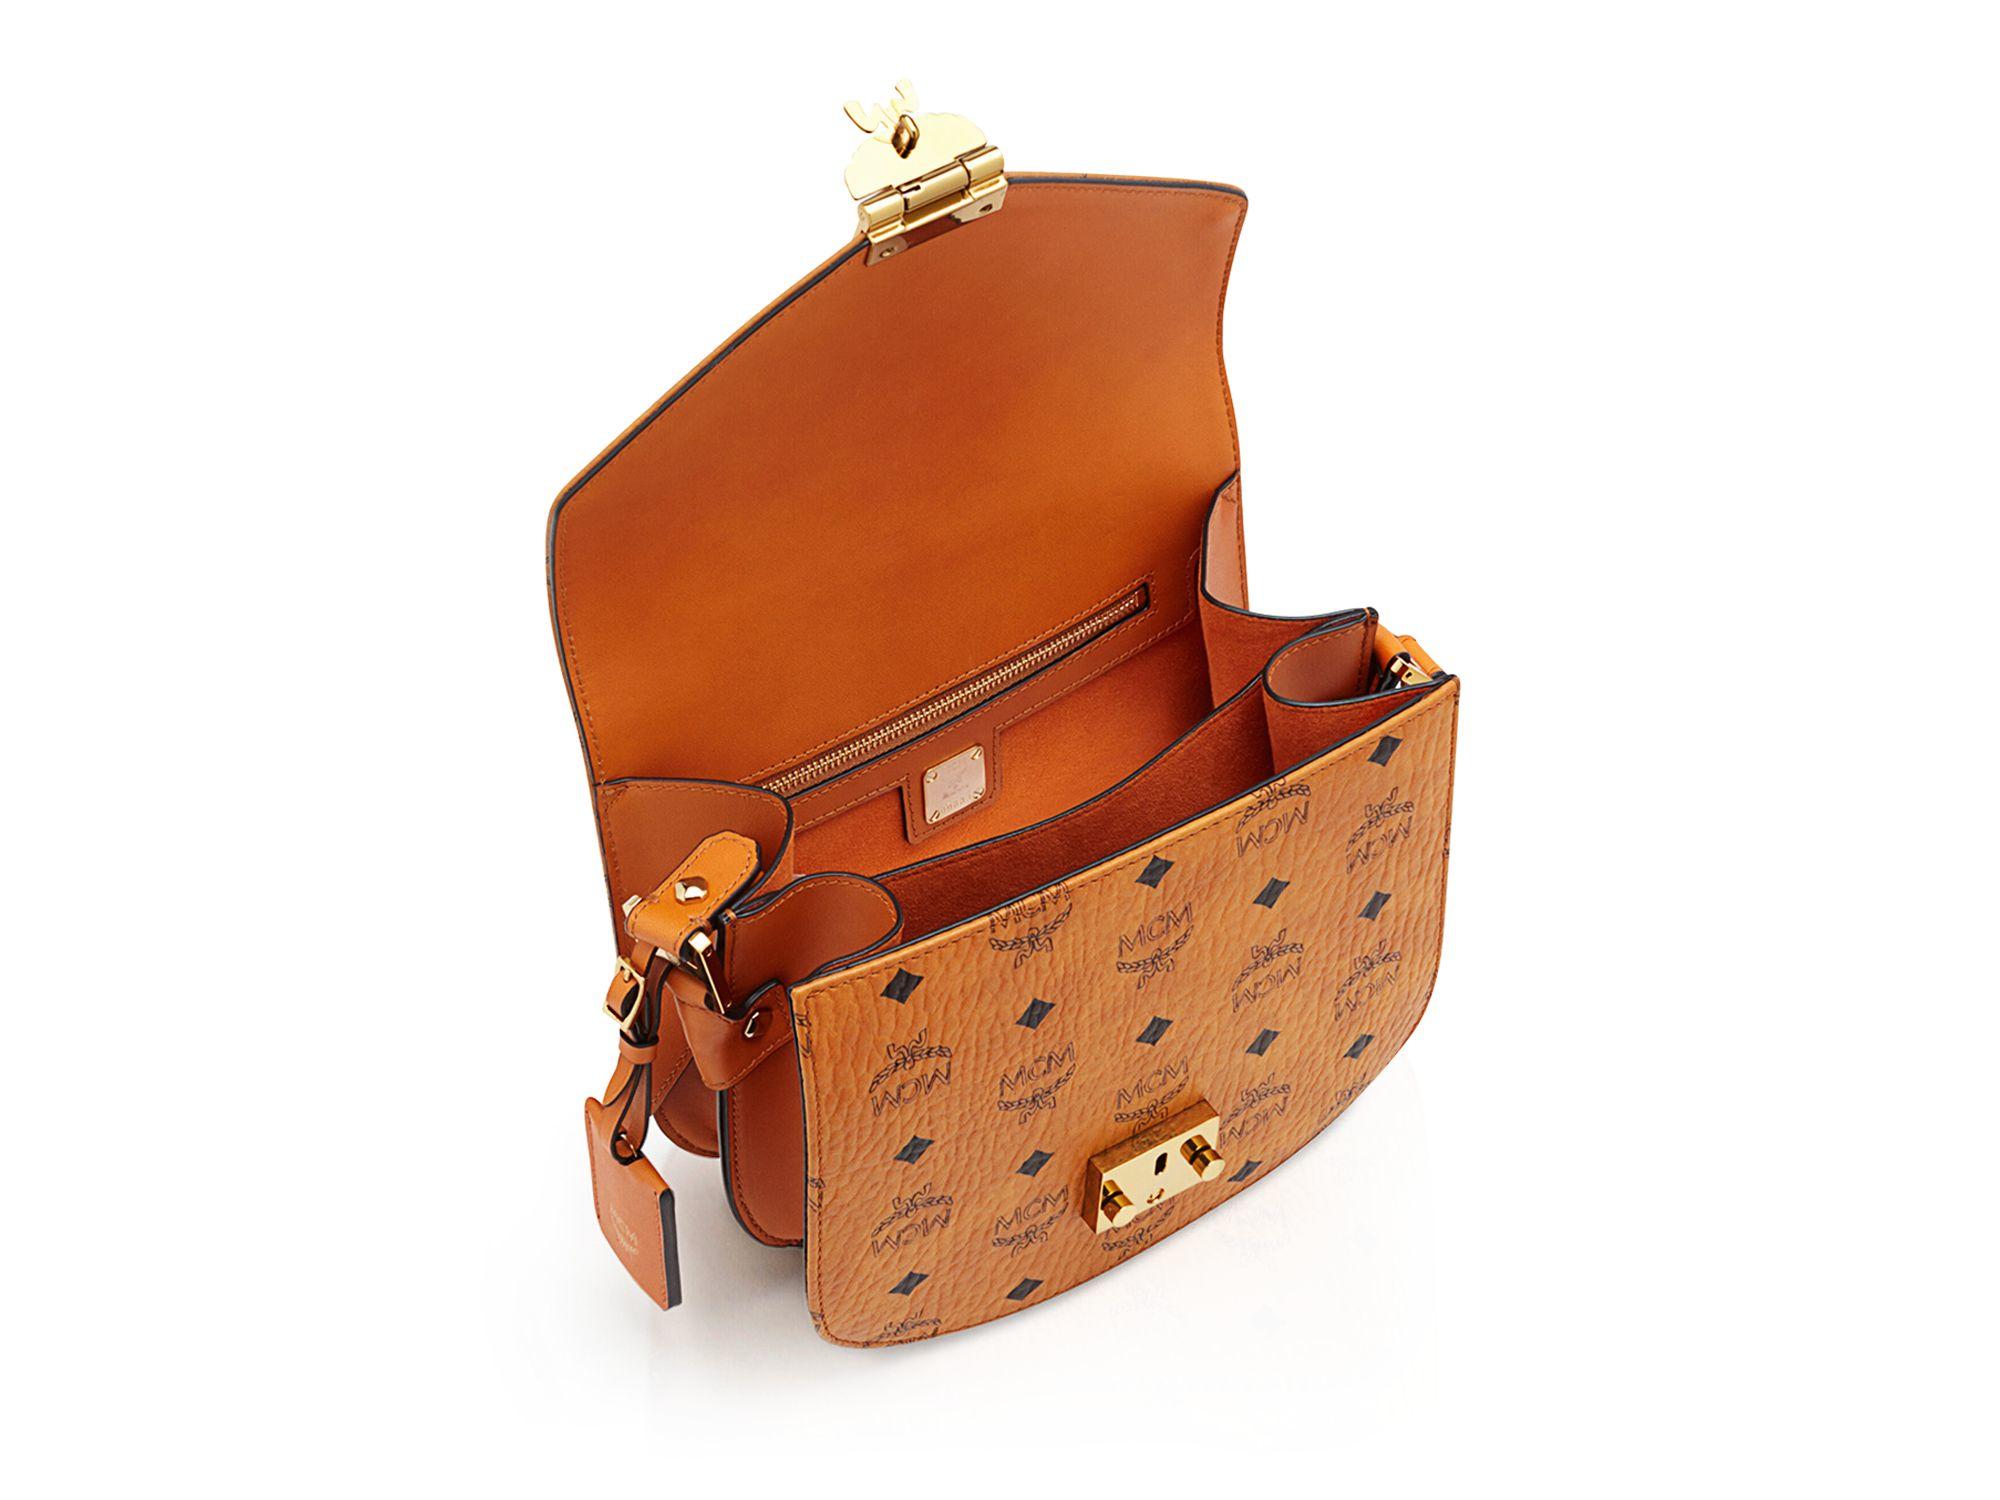 Lyst - MCM Patricia Visetos Shoulder Bag in Brown c3ee87e5f226b